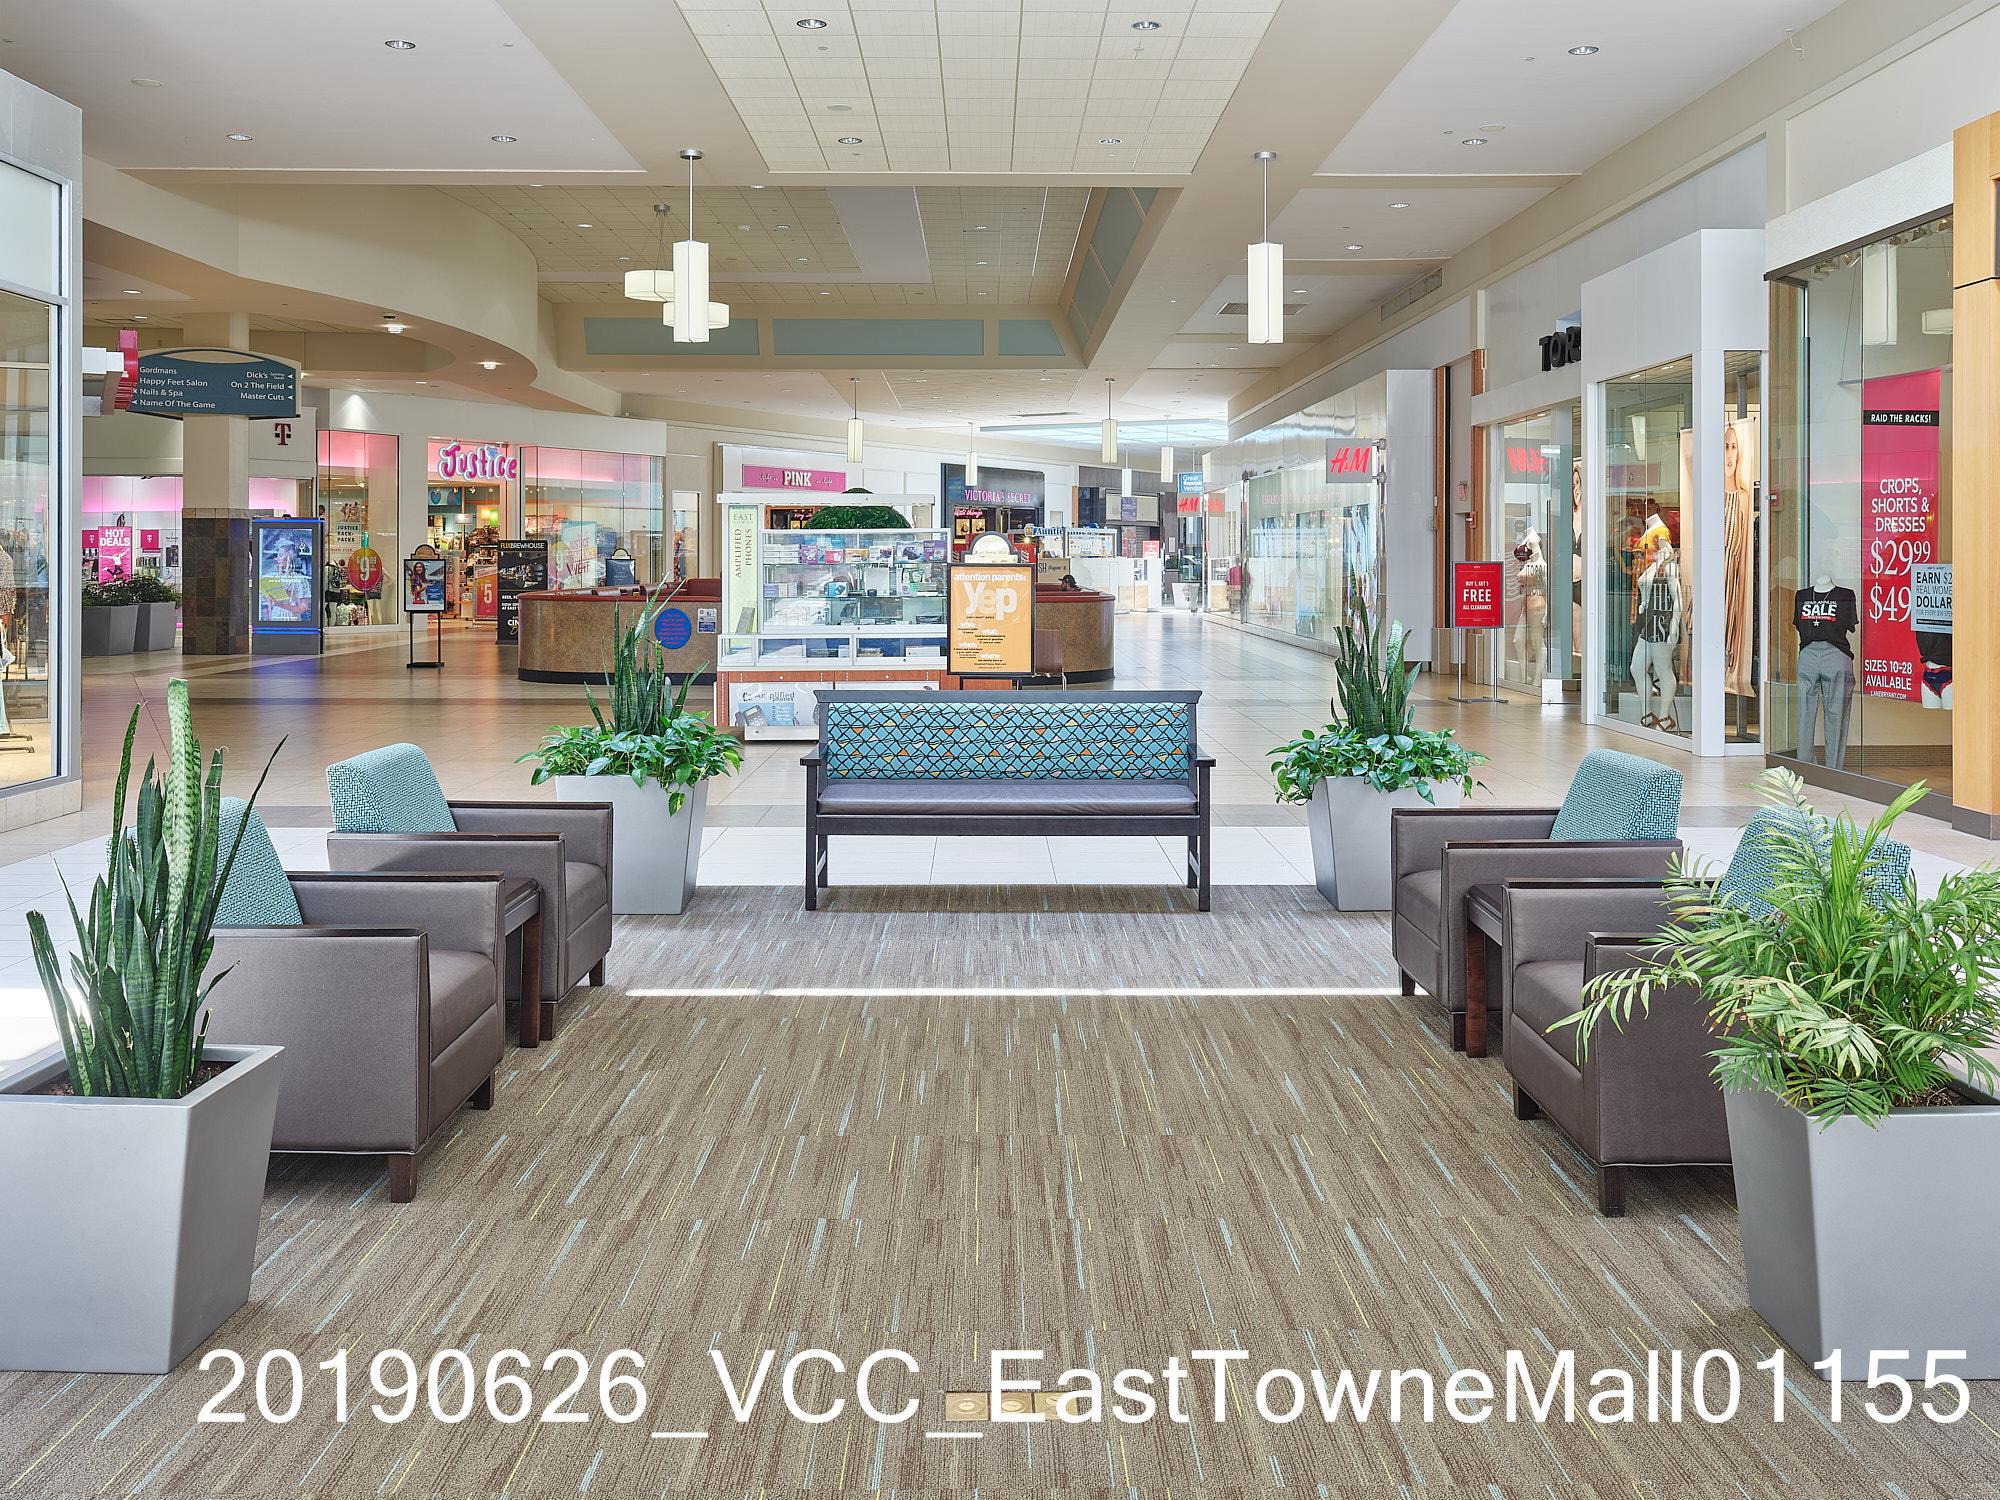 20190626_VCC_EastTowneMall01155.jpg